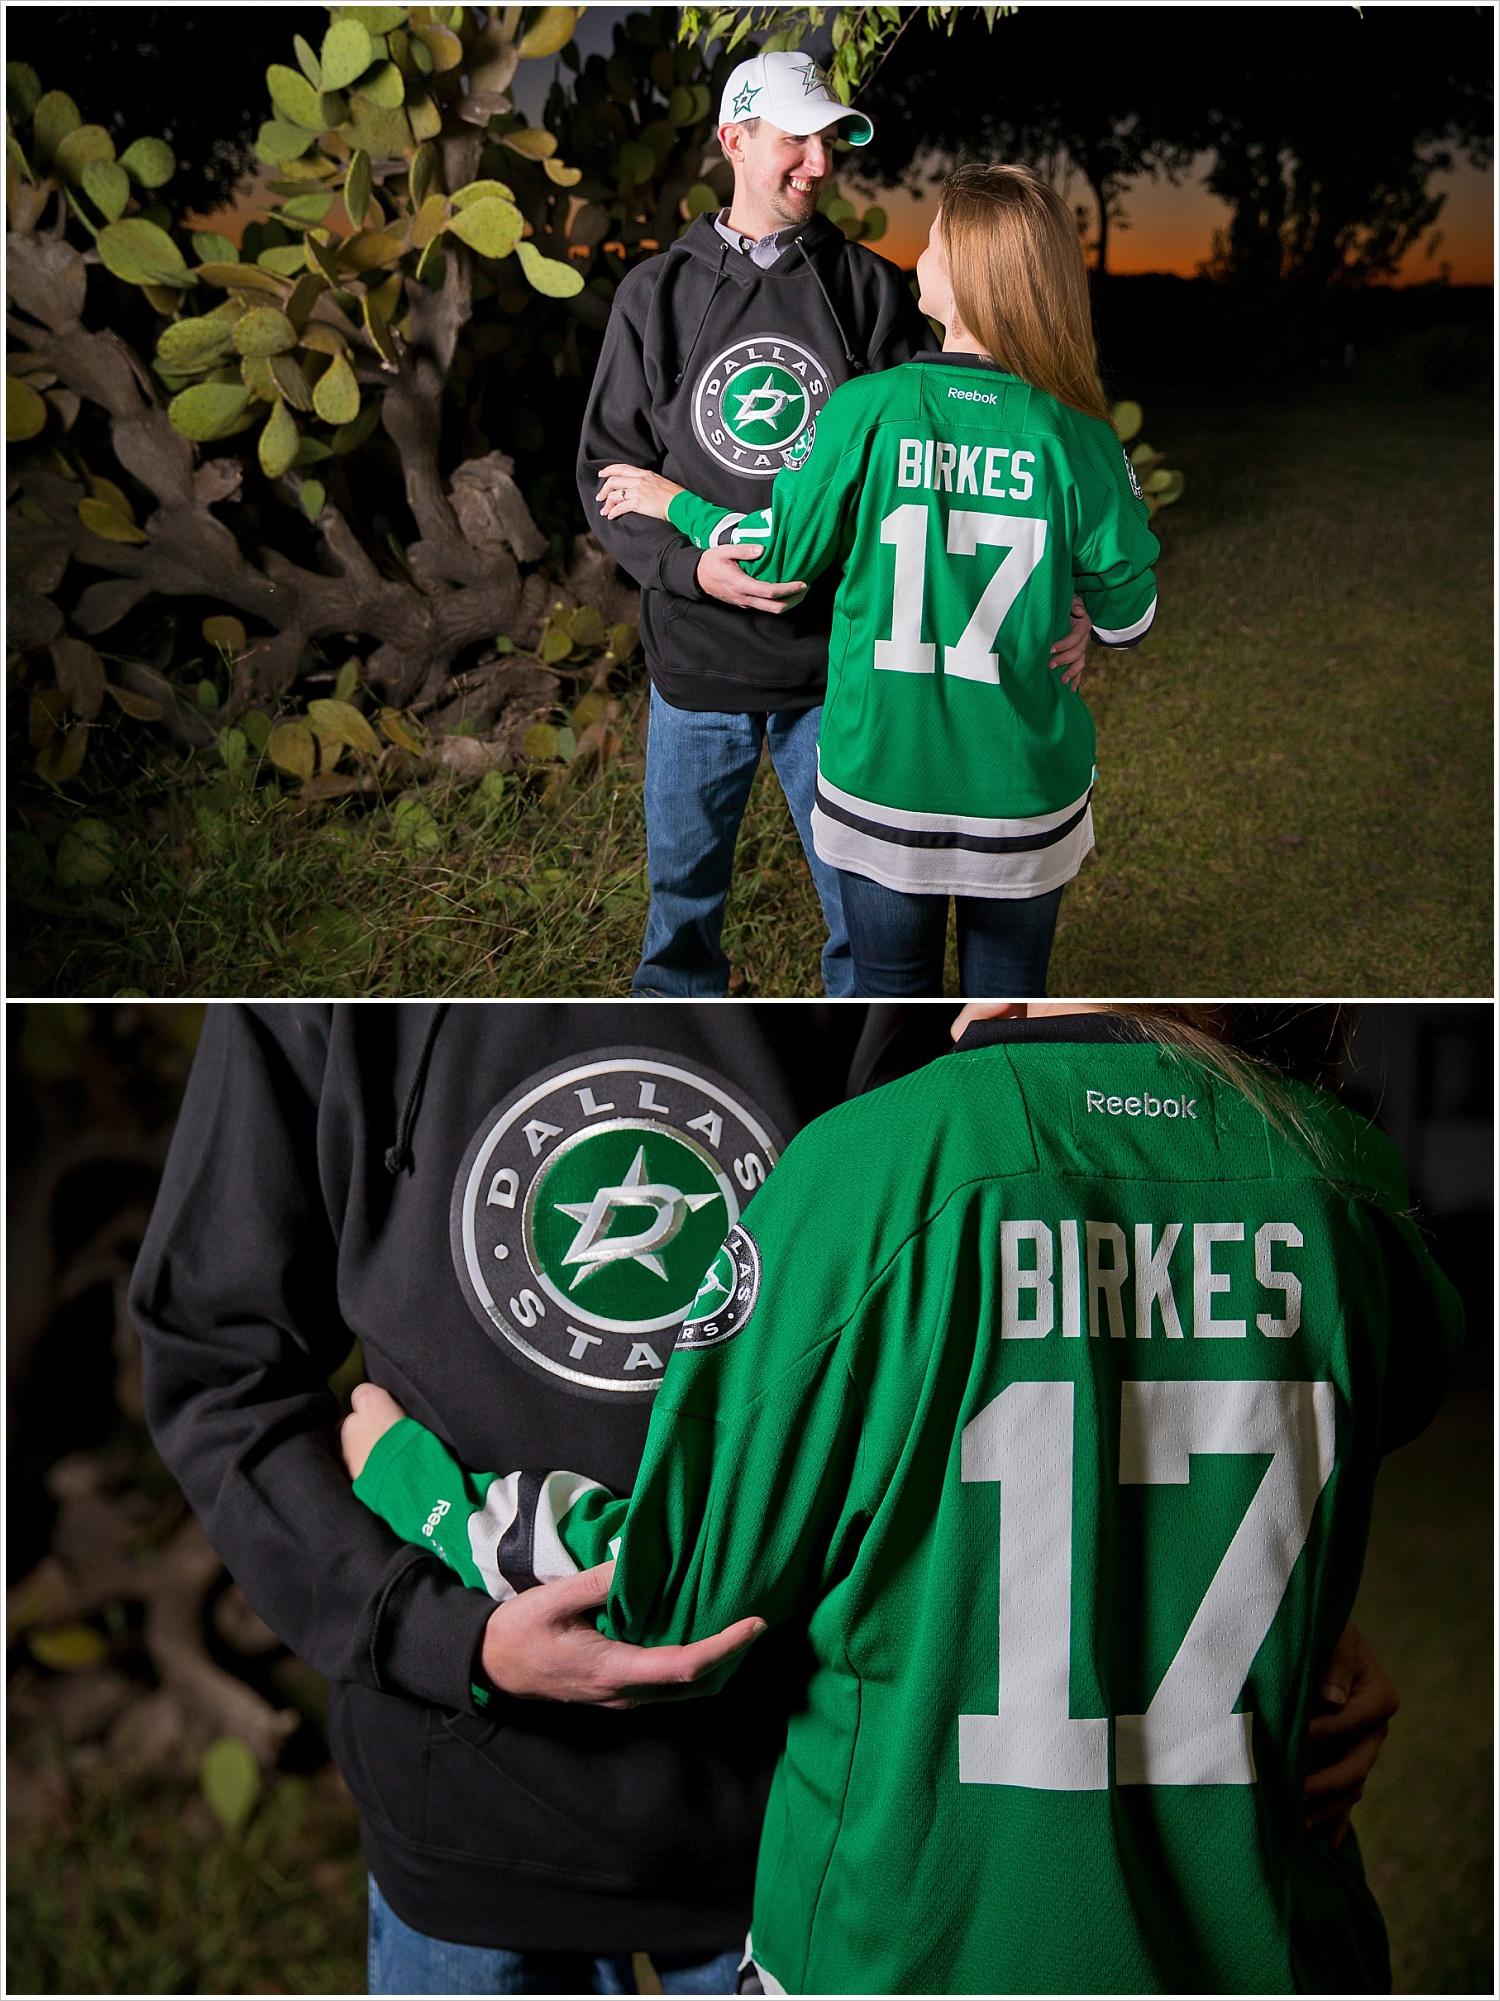 a couple shows off their Dallas Stars apparel | West, Texas Engagement Portraits | Jason & Melaina Photography